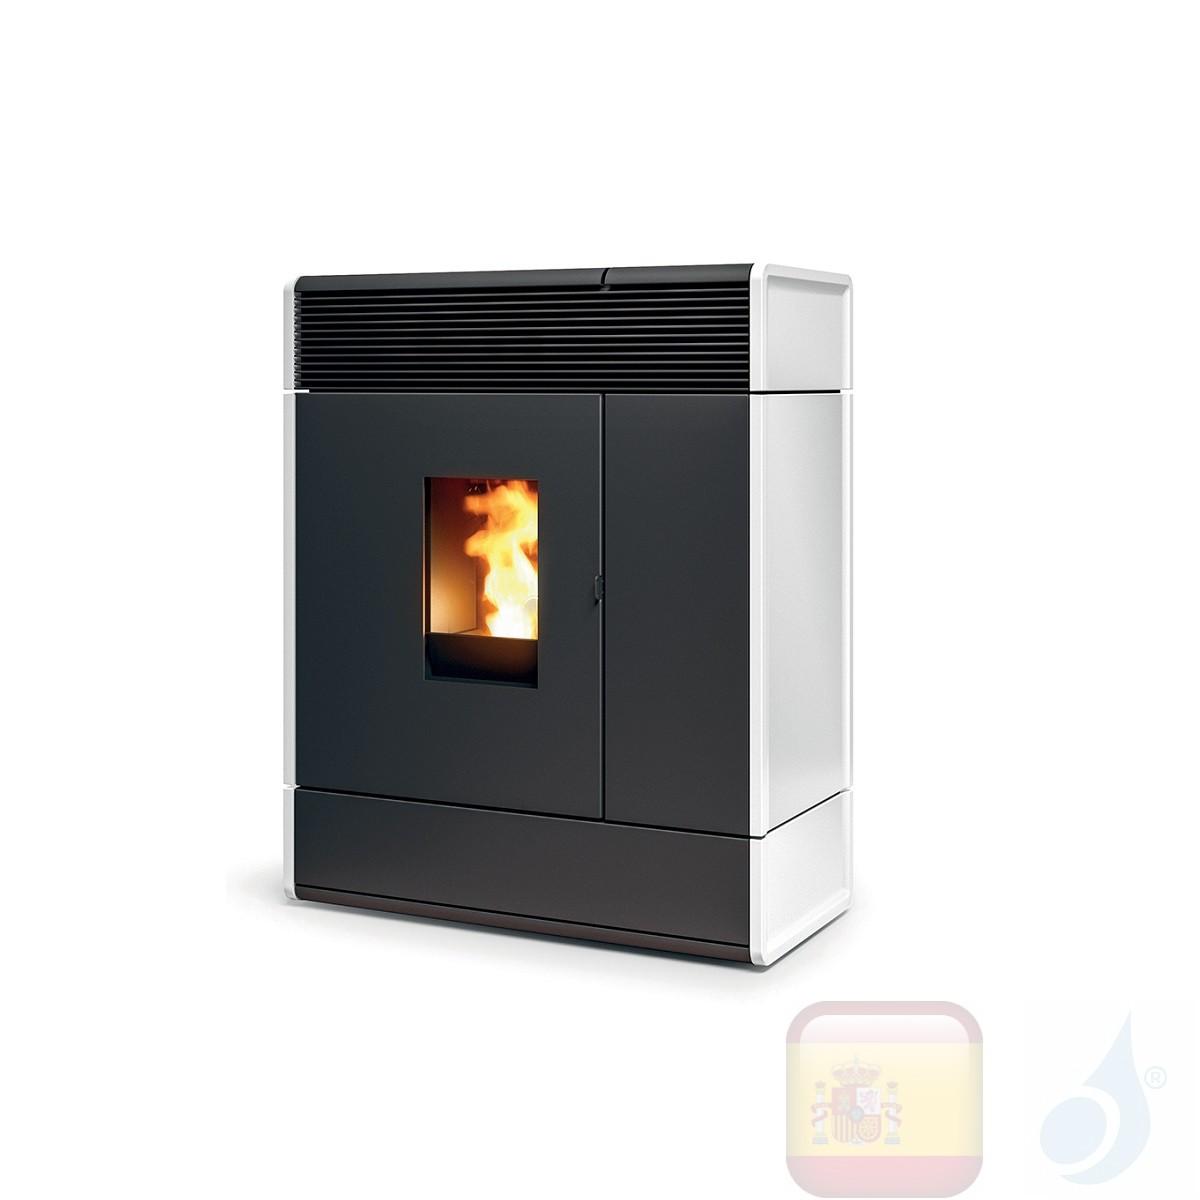 Estufa termo de pellets MCZ 16.1 kW Aki Hydromatic 16 M1 Blanco